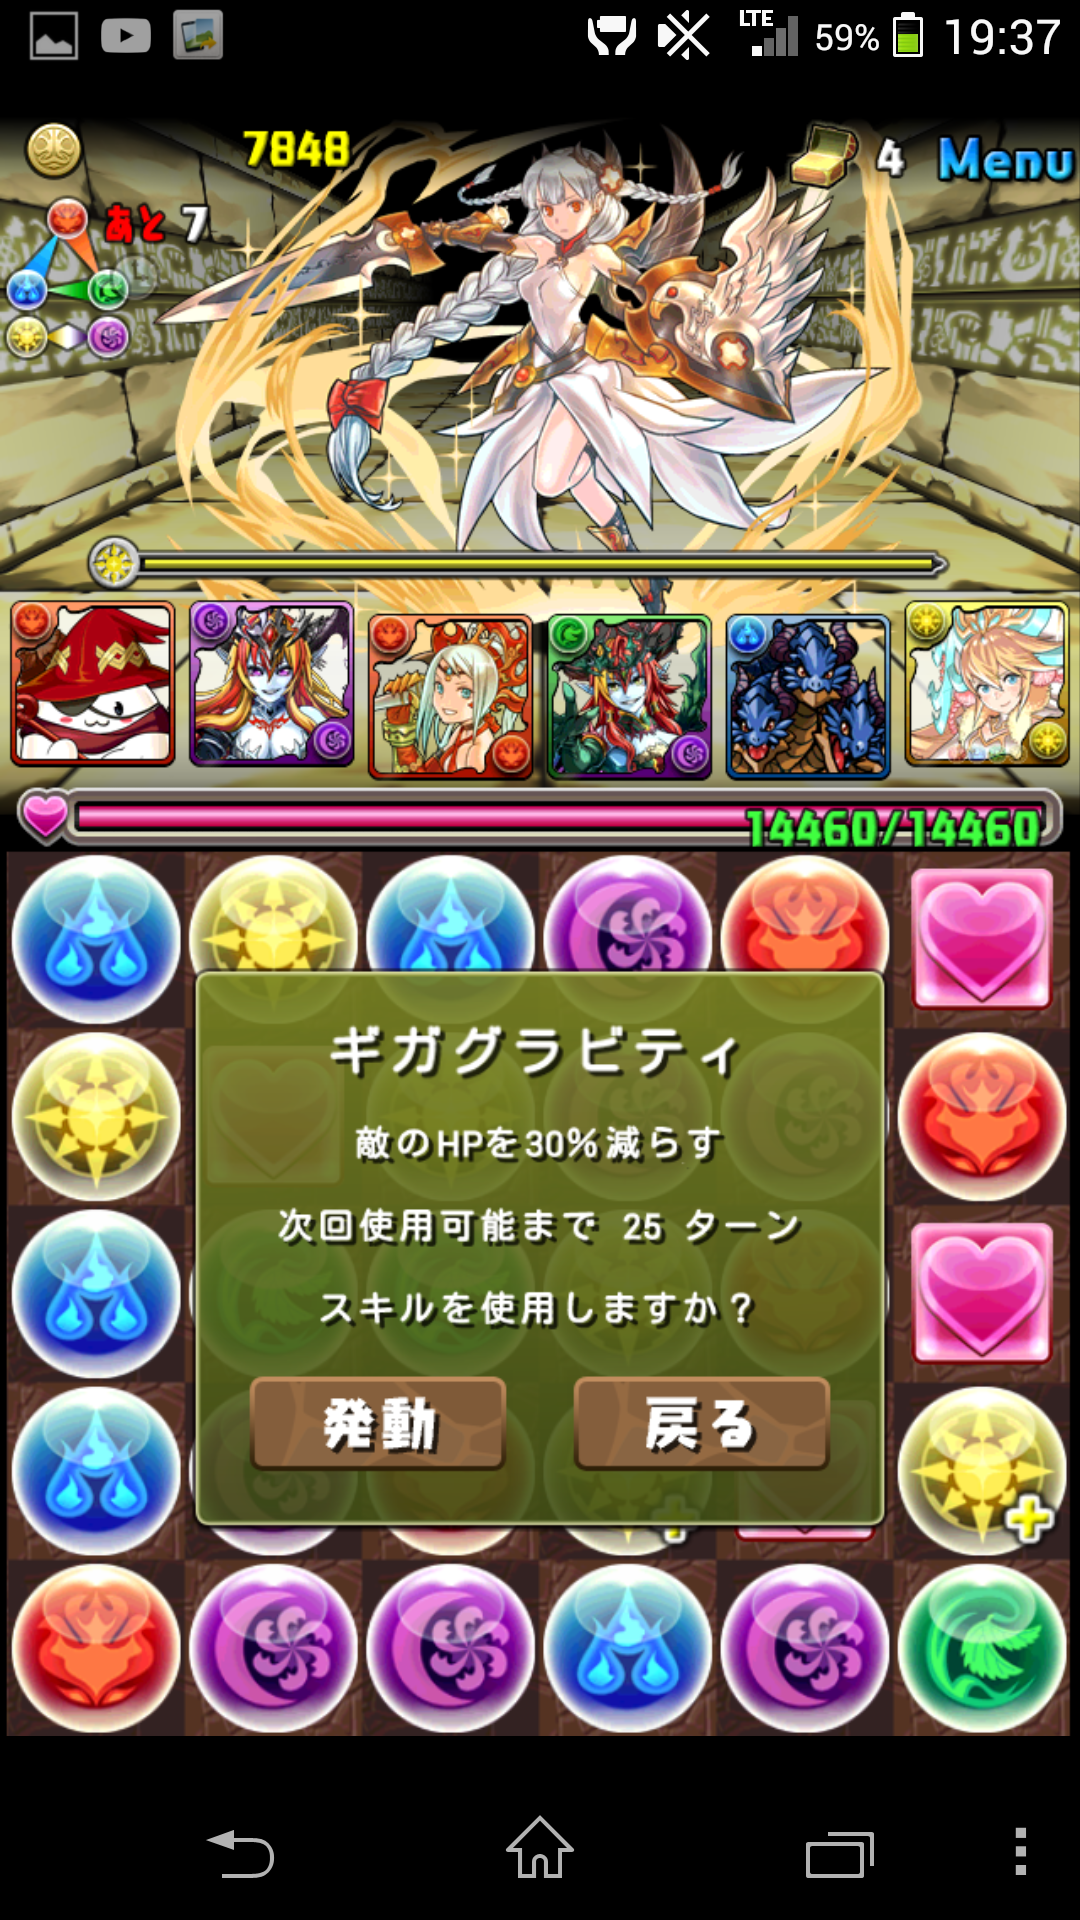 Screenshot_2014-05-17-19-37-31.png